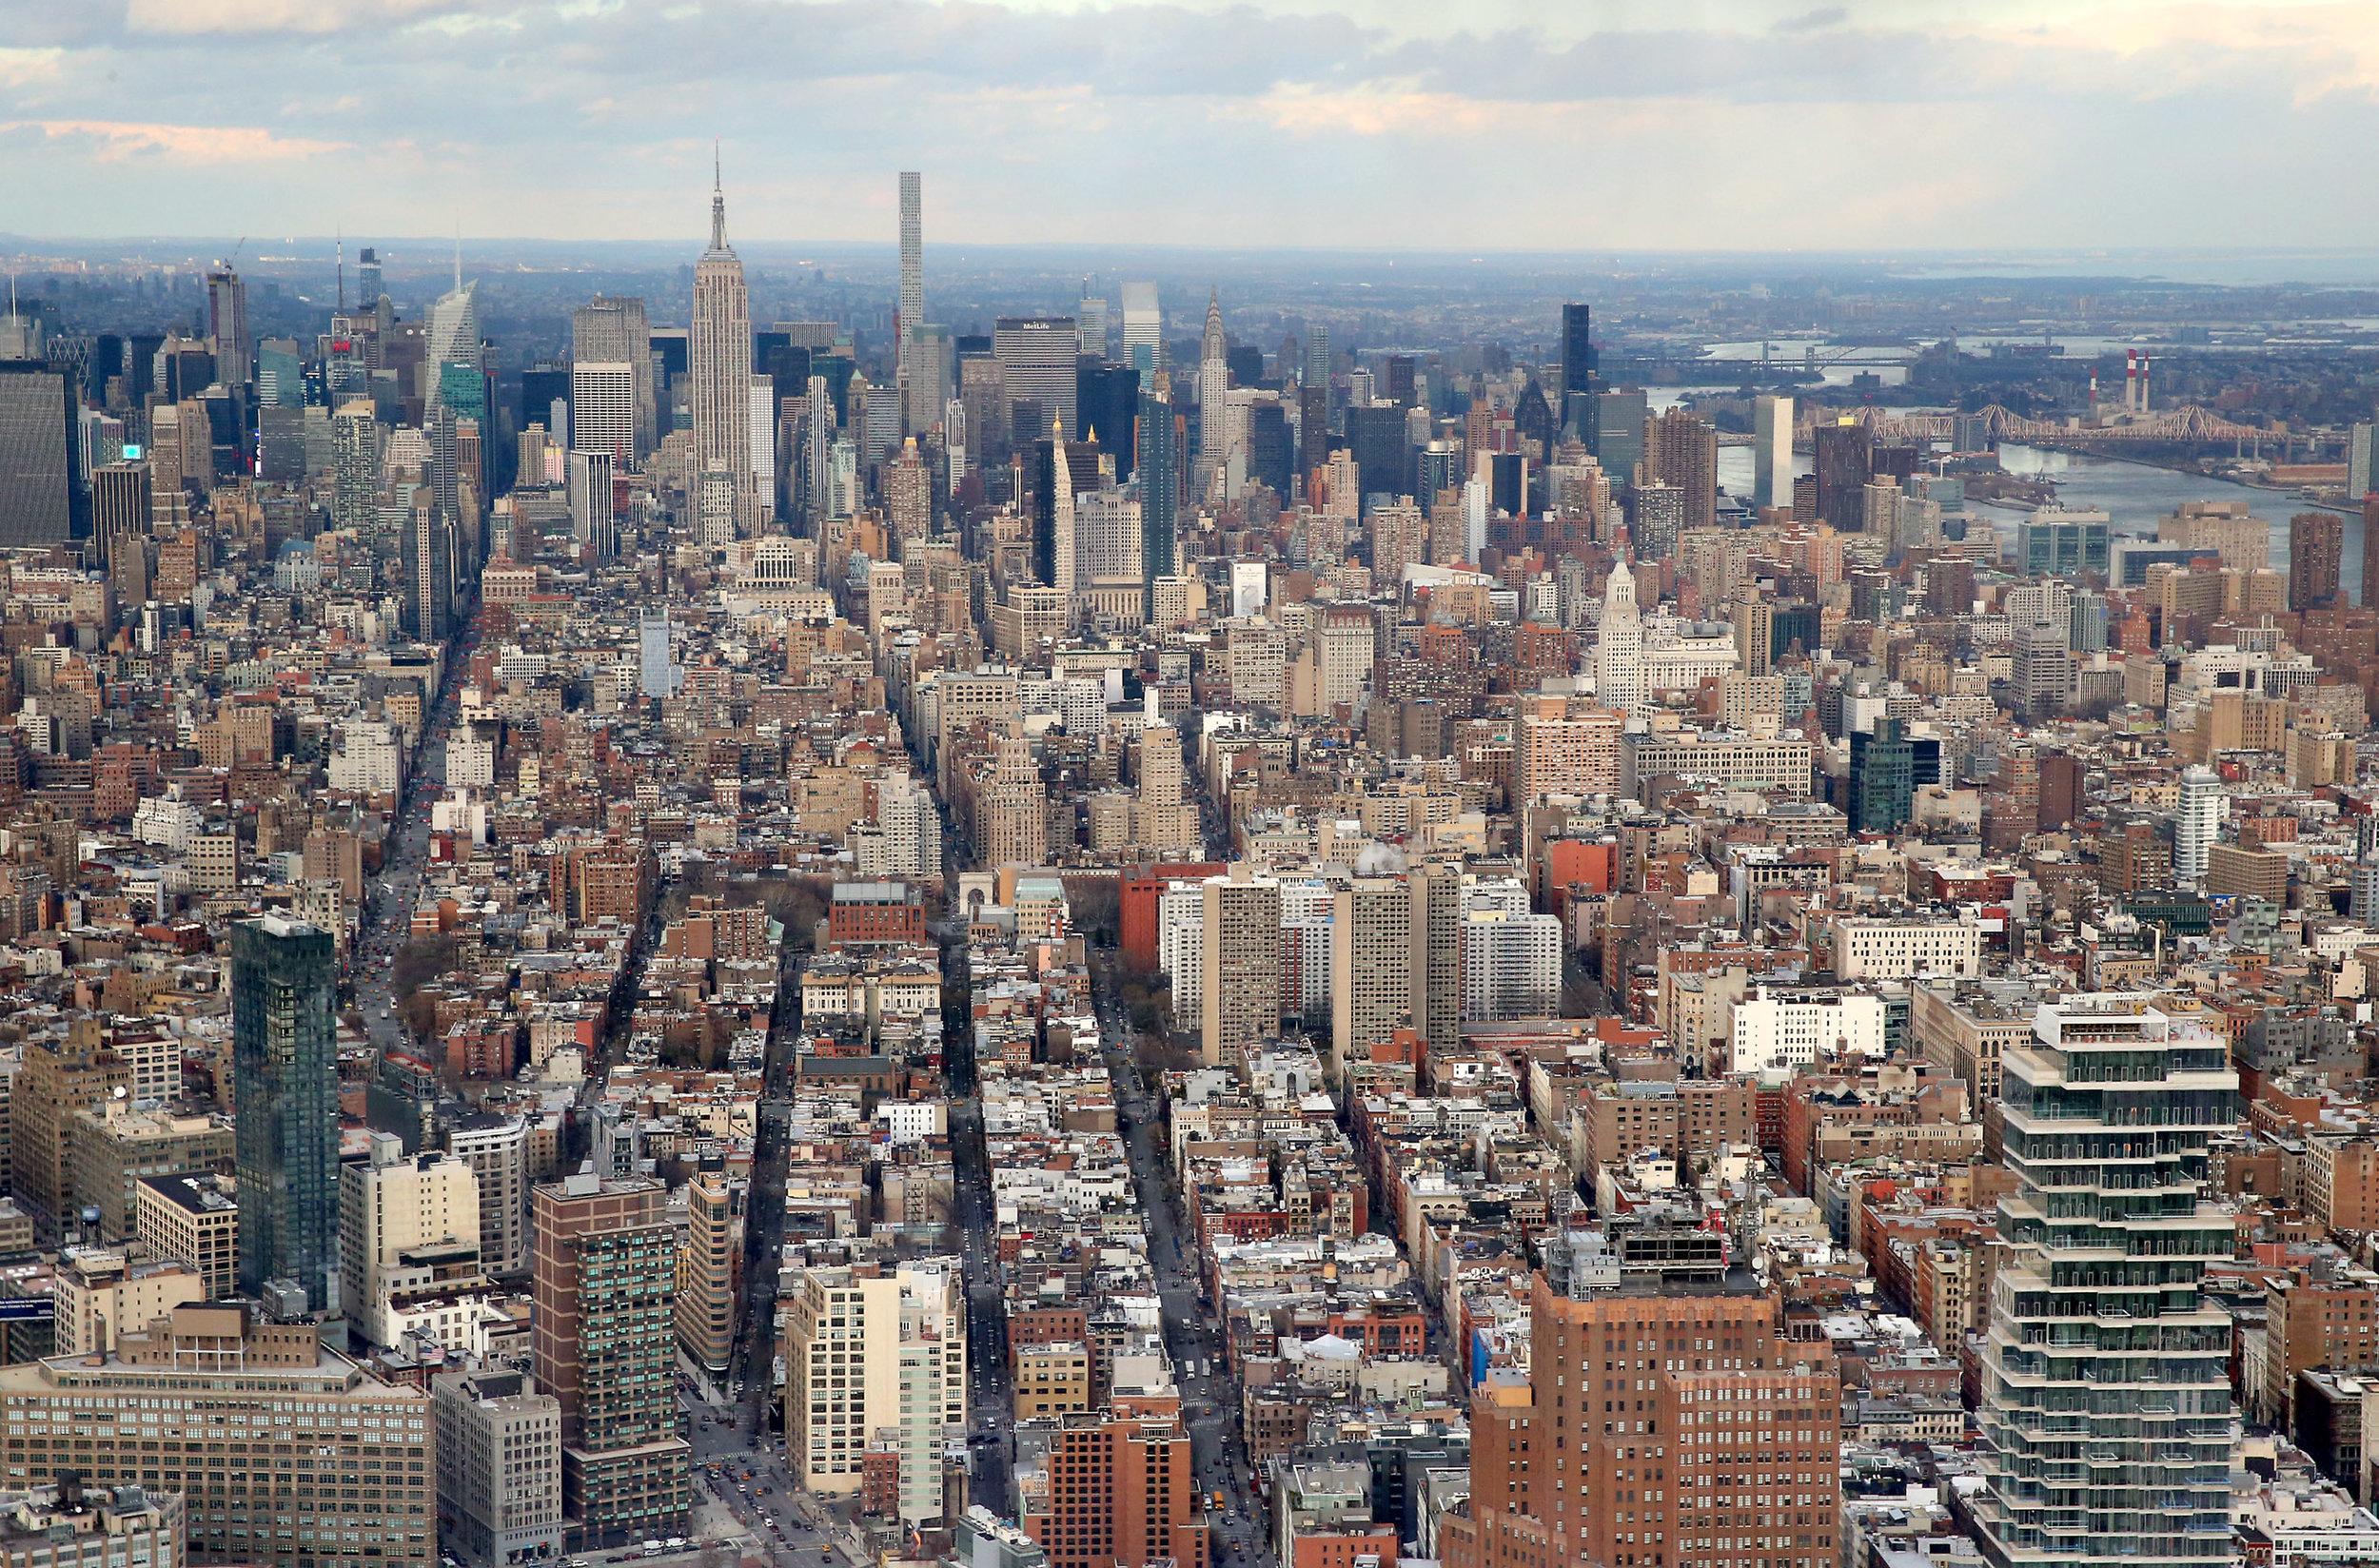 Manhattan from above, 2017 © State of Upper Austria / Denise Stinglmayr